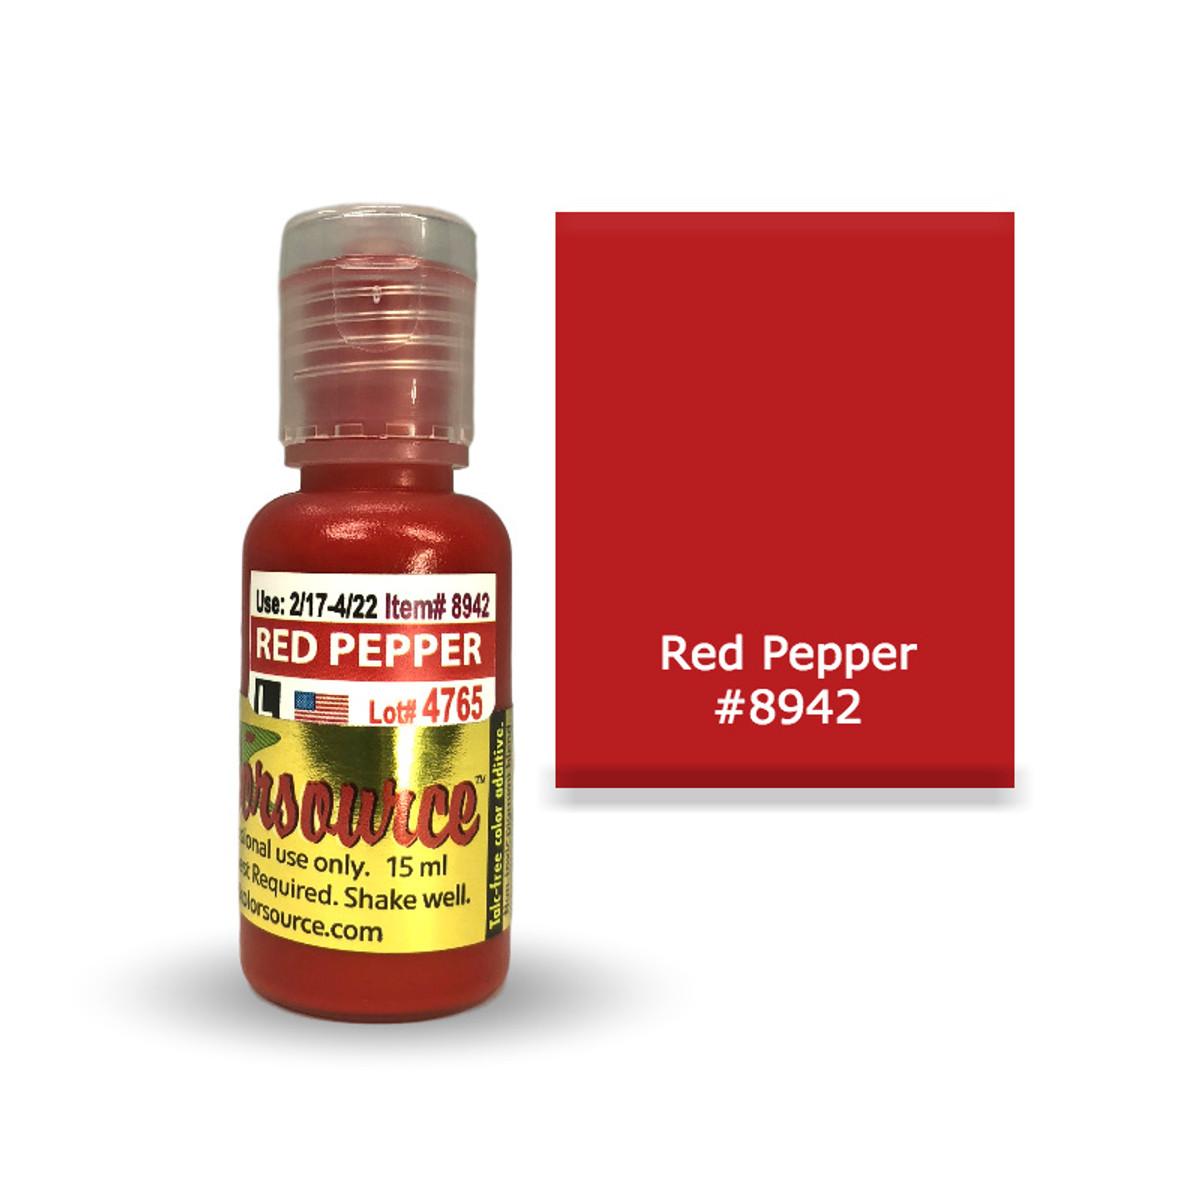 Kolorsource Permanent Makeup Pigment (PMU) Red Pepper #8942 - 15ml